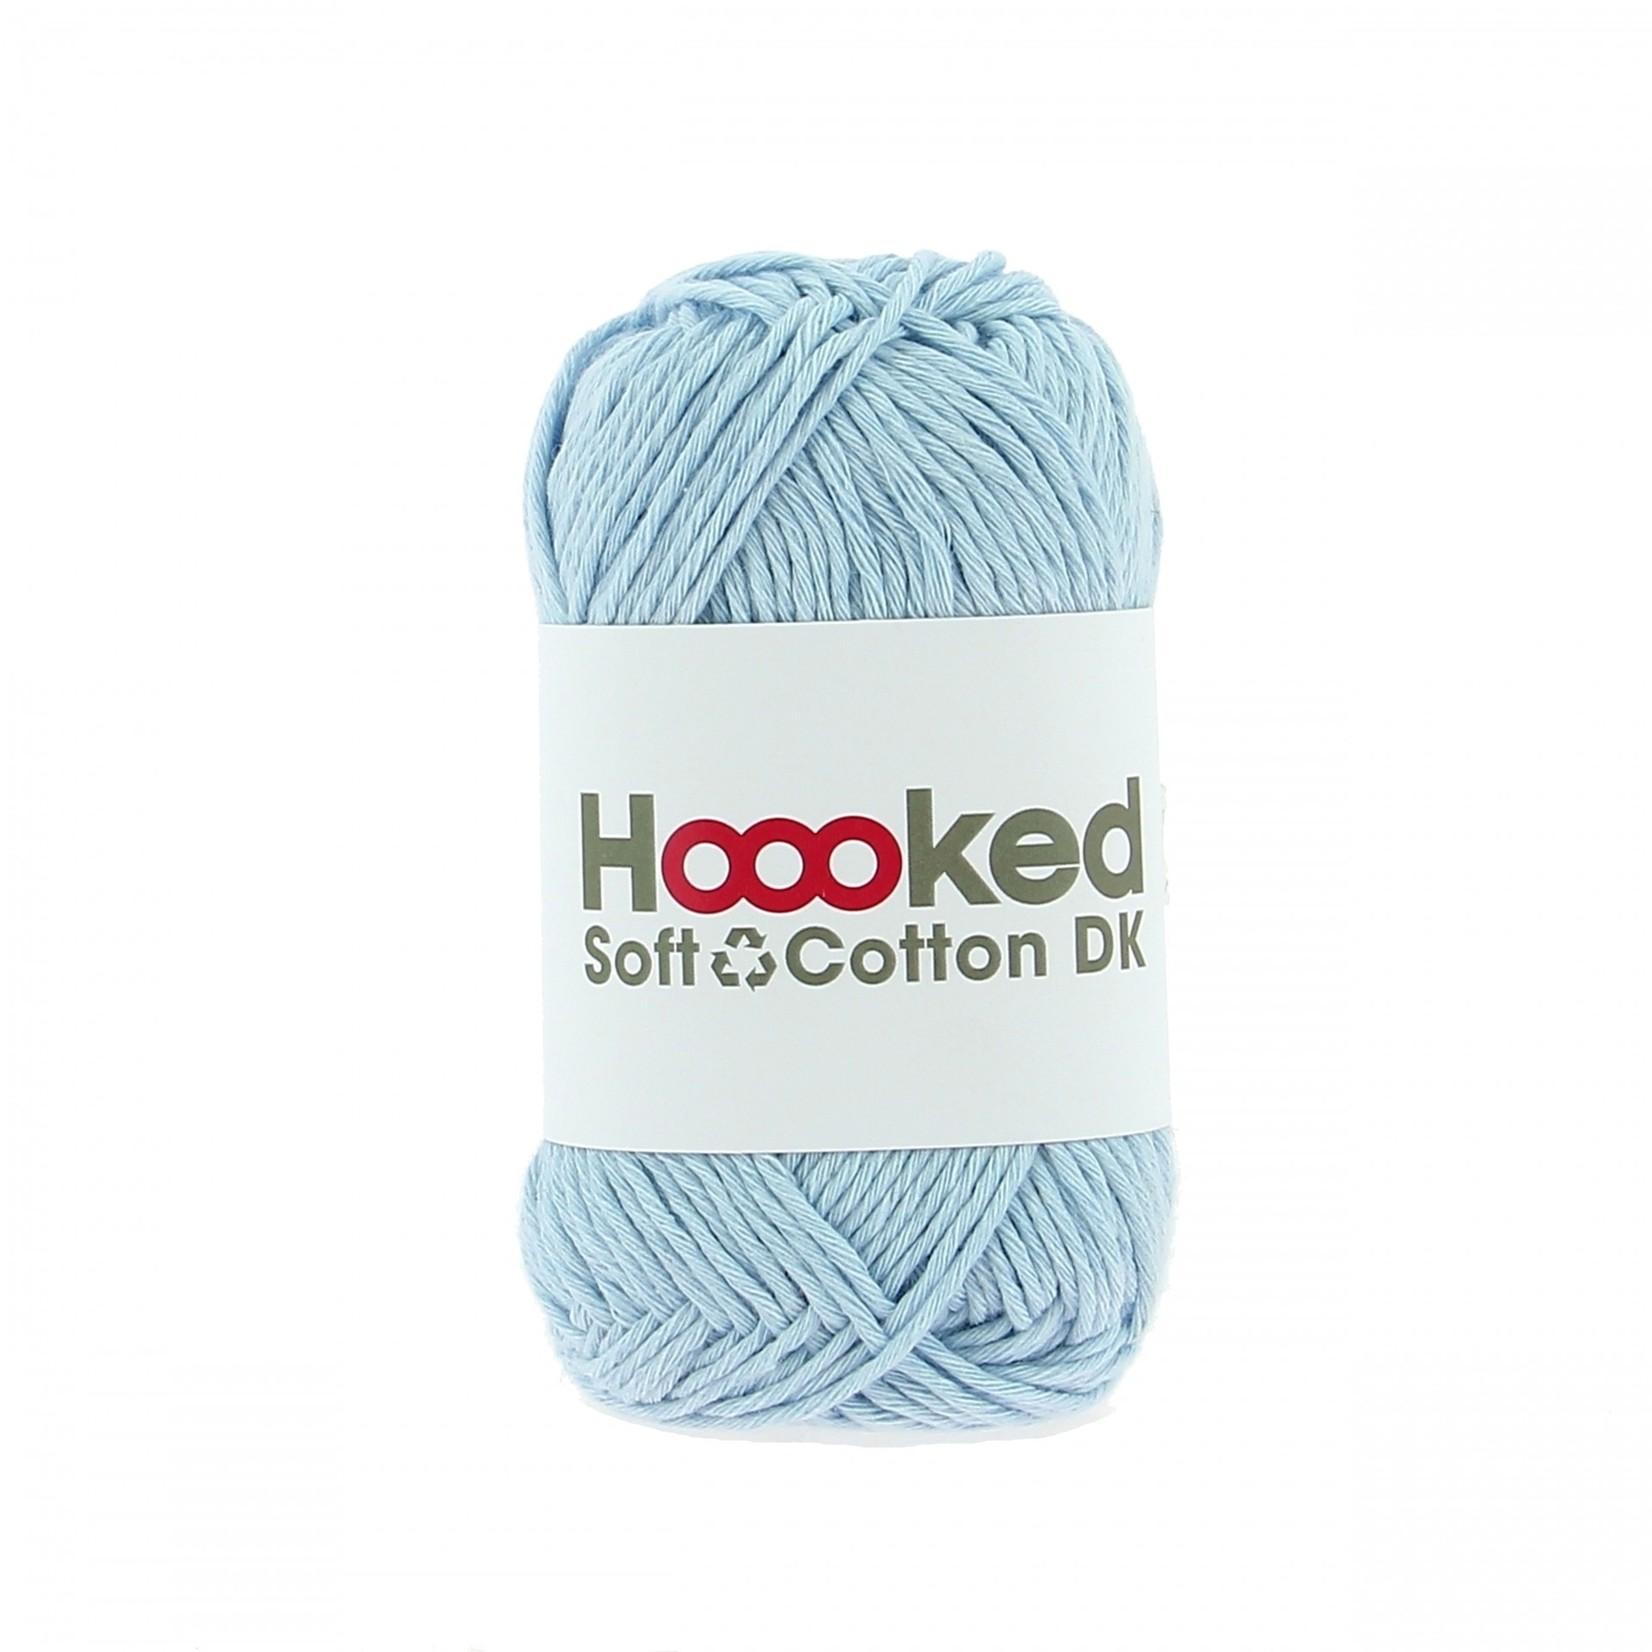 Hoooked Hoooked Soft Cotton DK Dublin Blue bundel 5 x 50 gr. / 85 m.